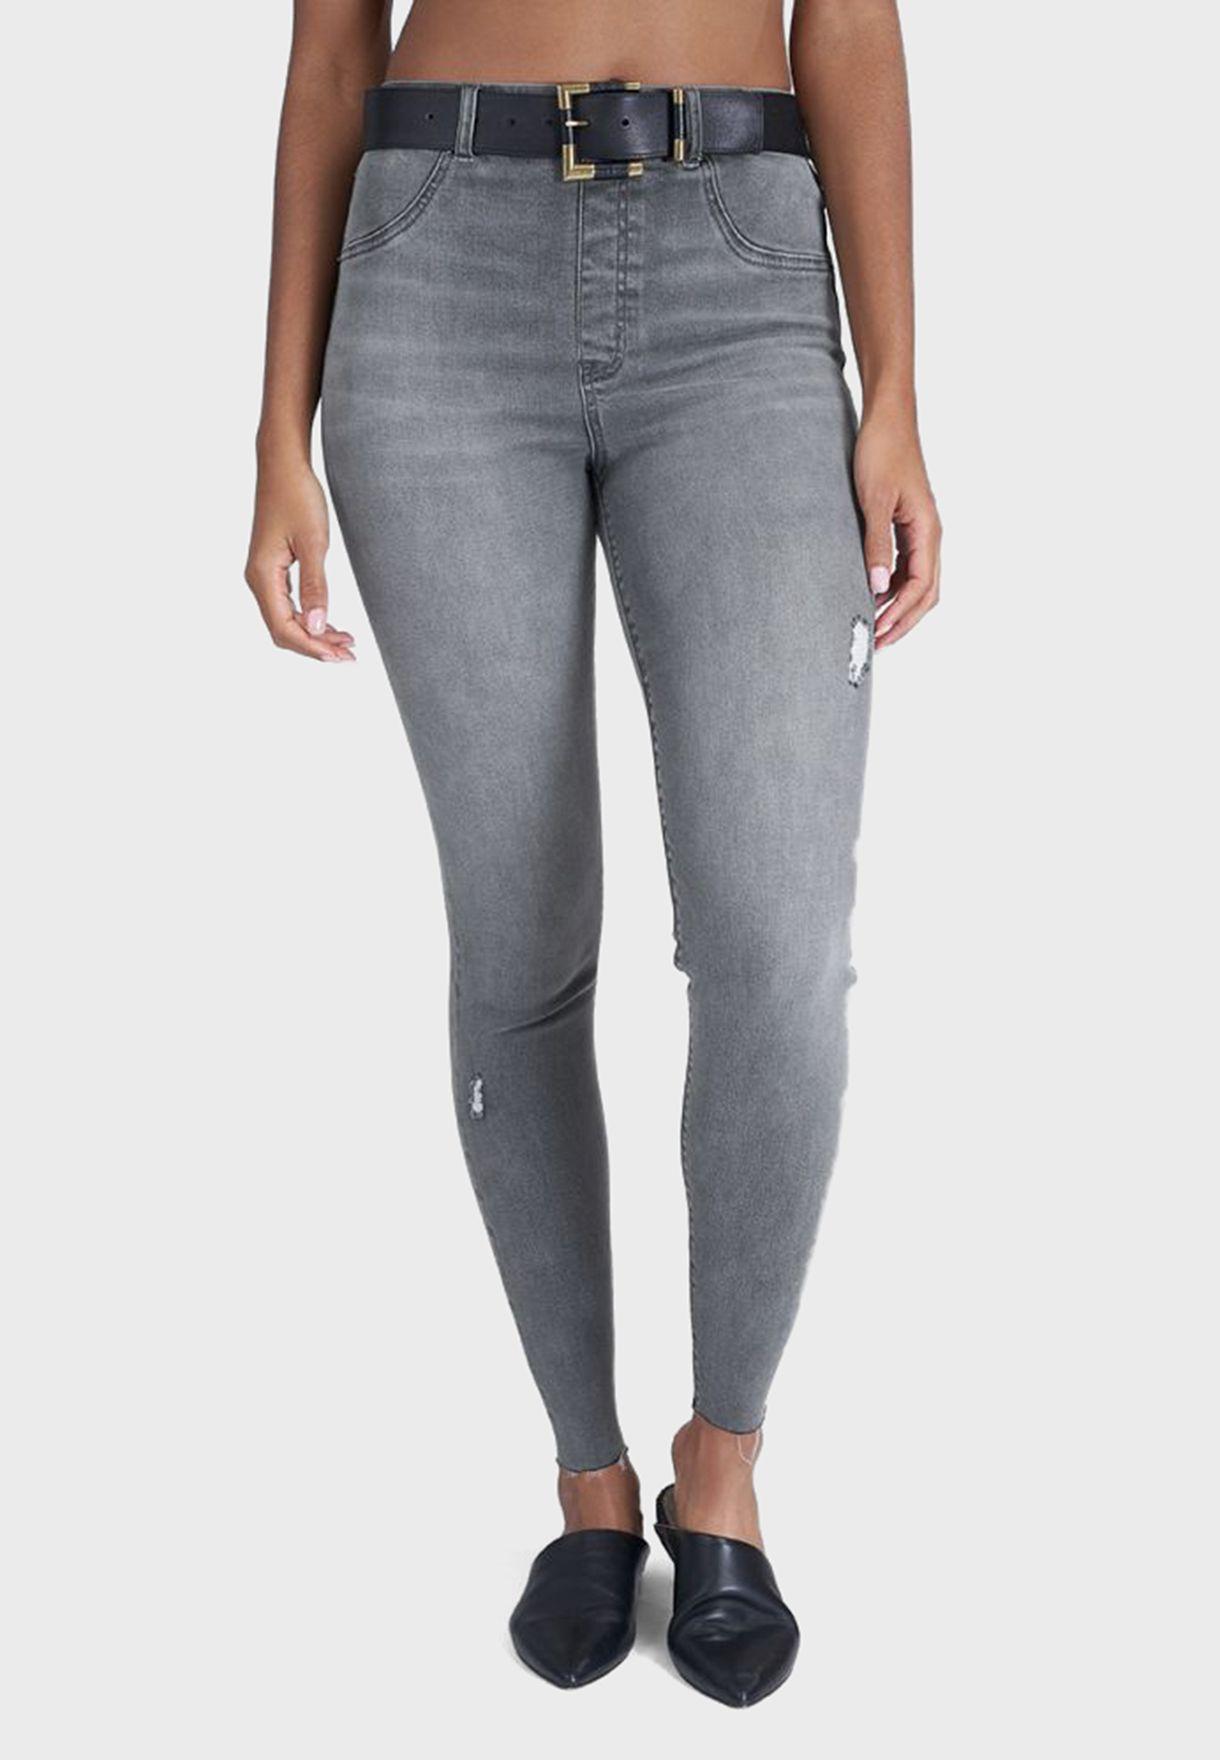 Vintage Distressed Ankle Skinny Jeans